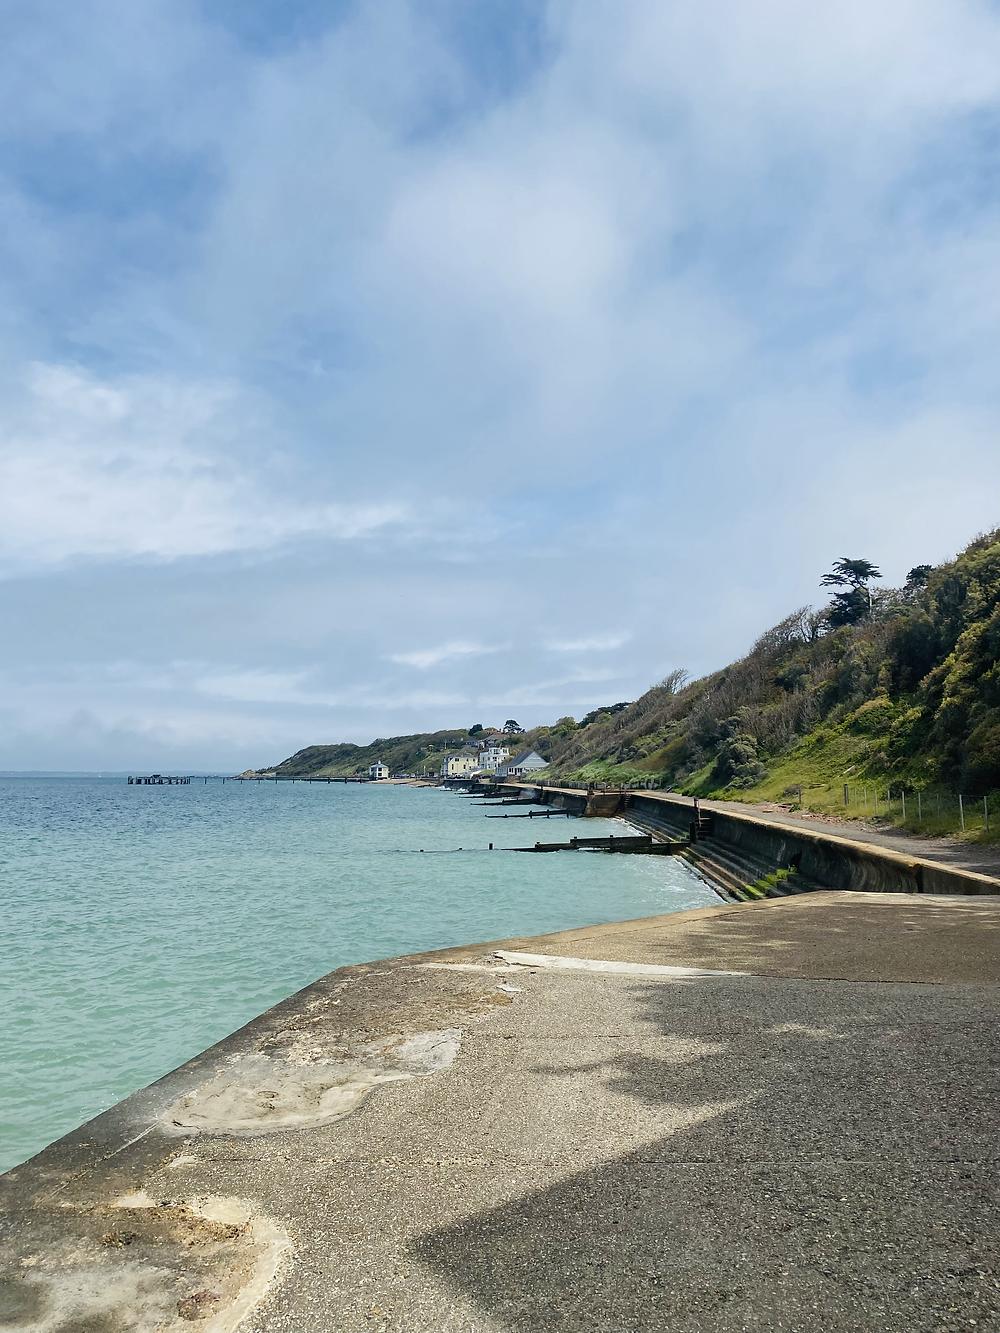 Beach photo at Freshwater Bay, Isle of Wight